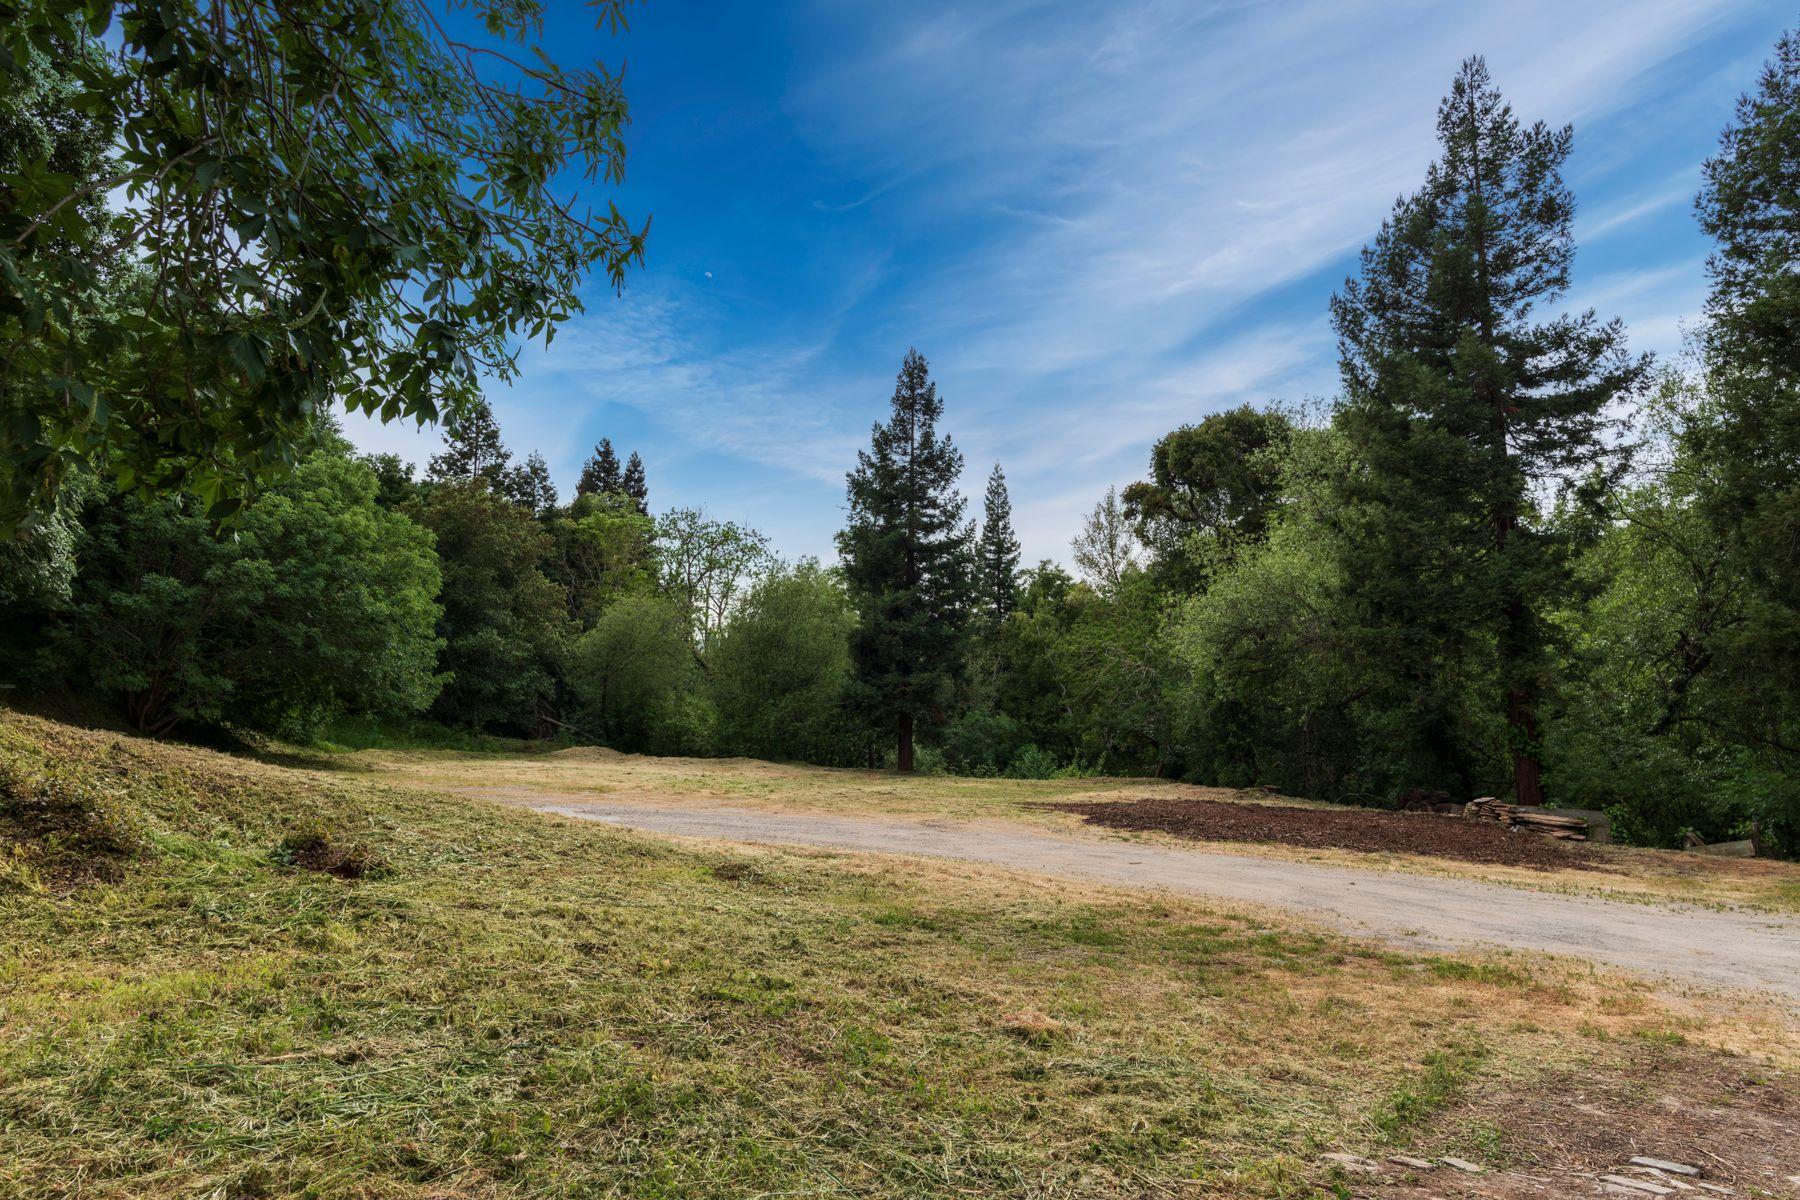 Land for Sale at Portola Valley Building Lot 0 Alpine Rd Portola Valley, California 94027 United States